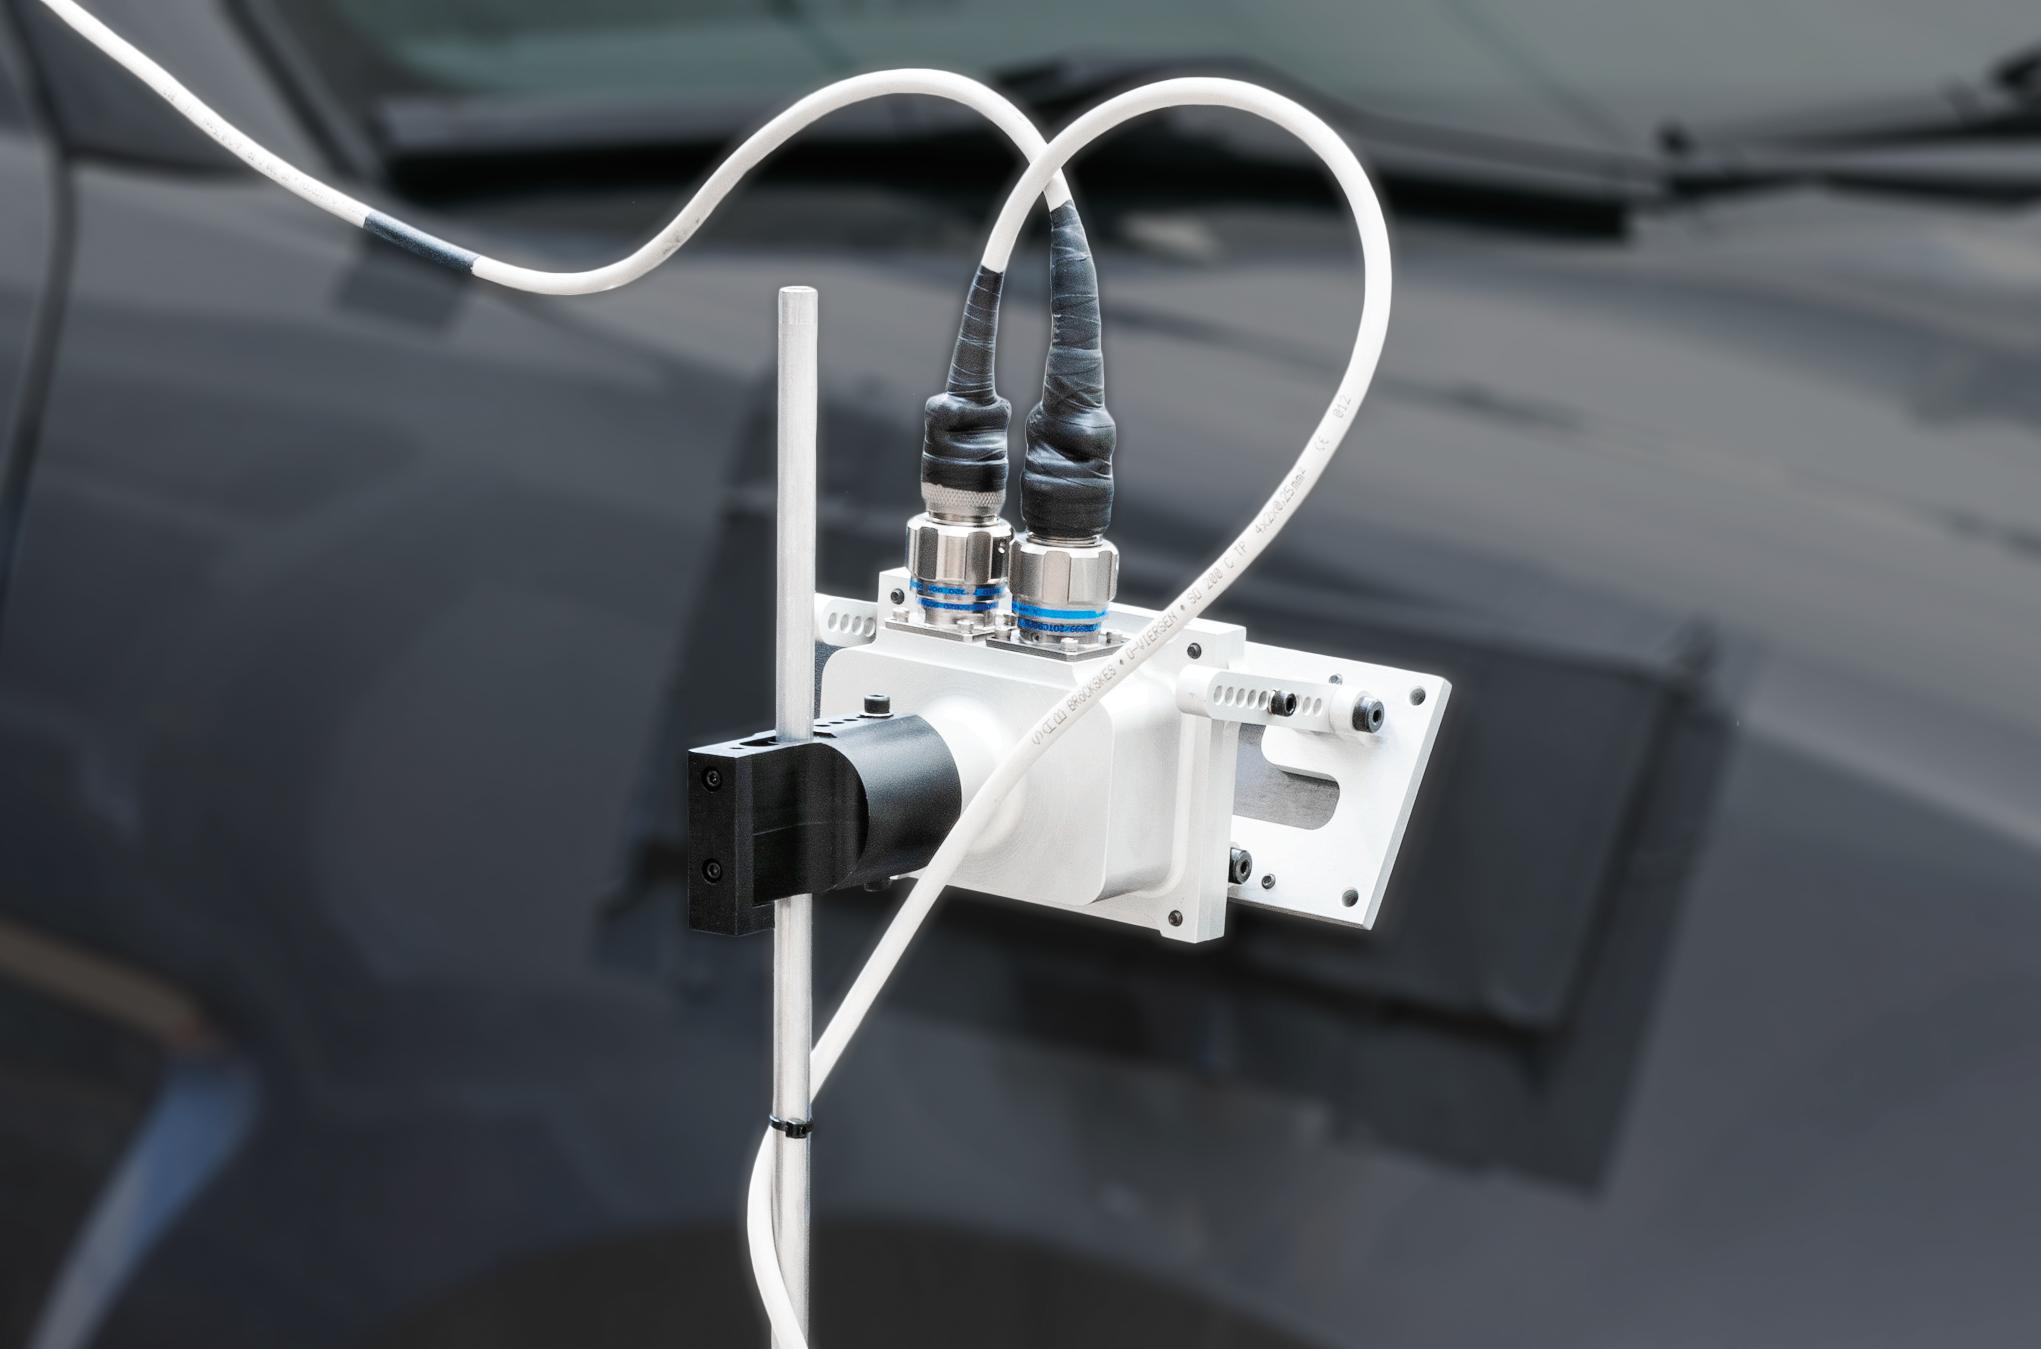 Stator Angle Correction Device for Wheel Force Tranducer